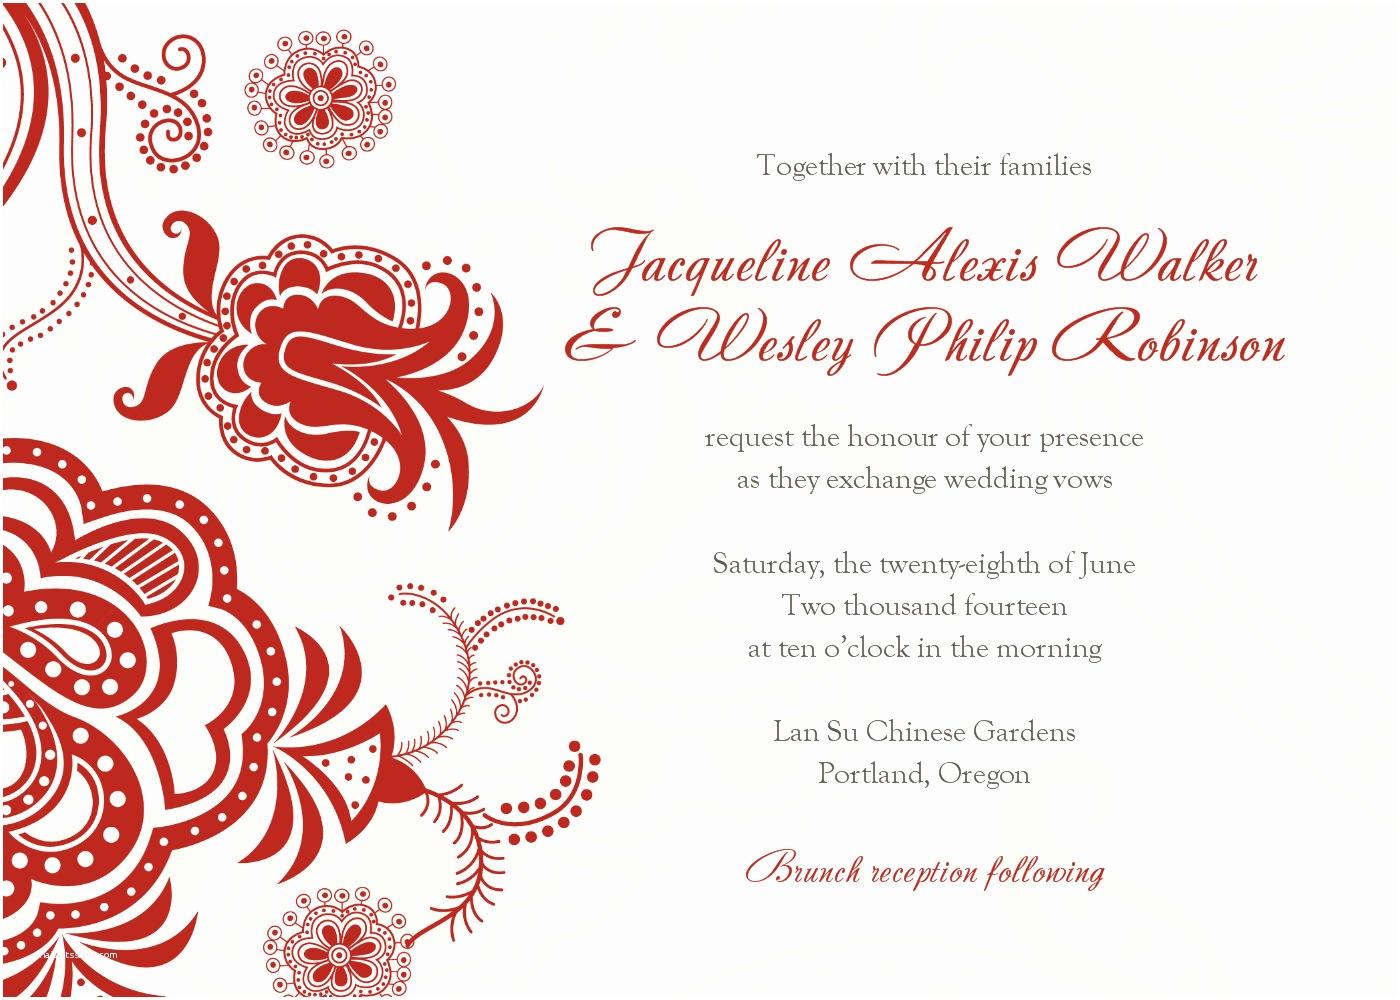 Create Your Own Wedding Invitations Free Free Wedding Invitations Templates